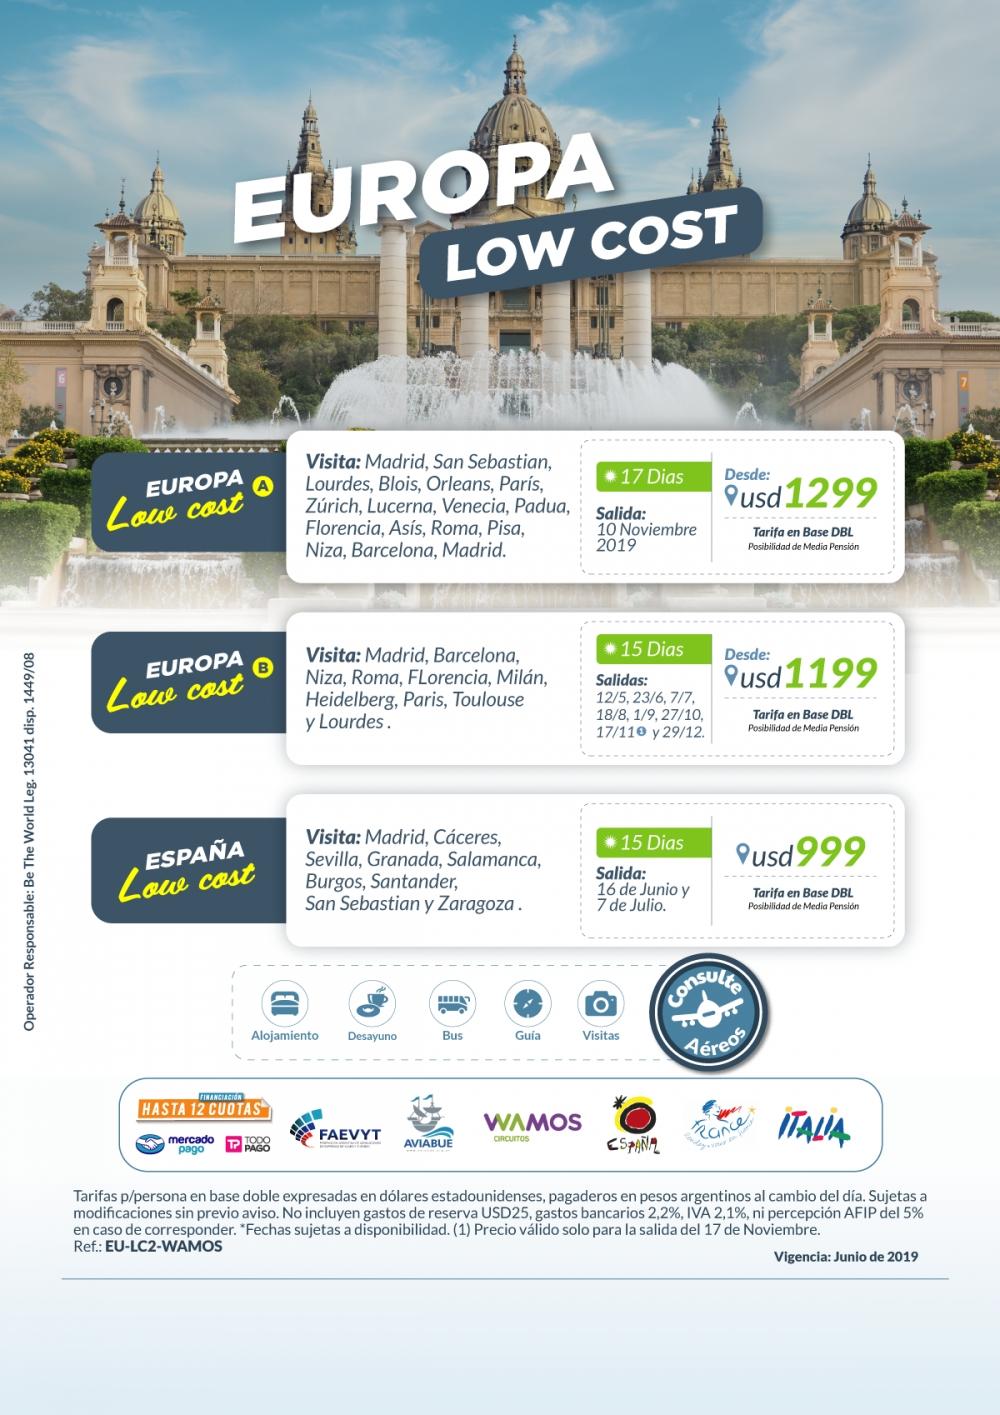 EUROPA LOW COST - Salidas Mayo a Diciembre